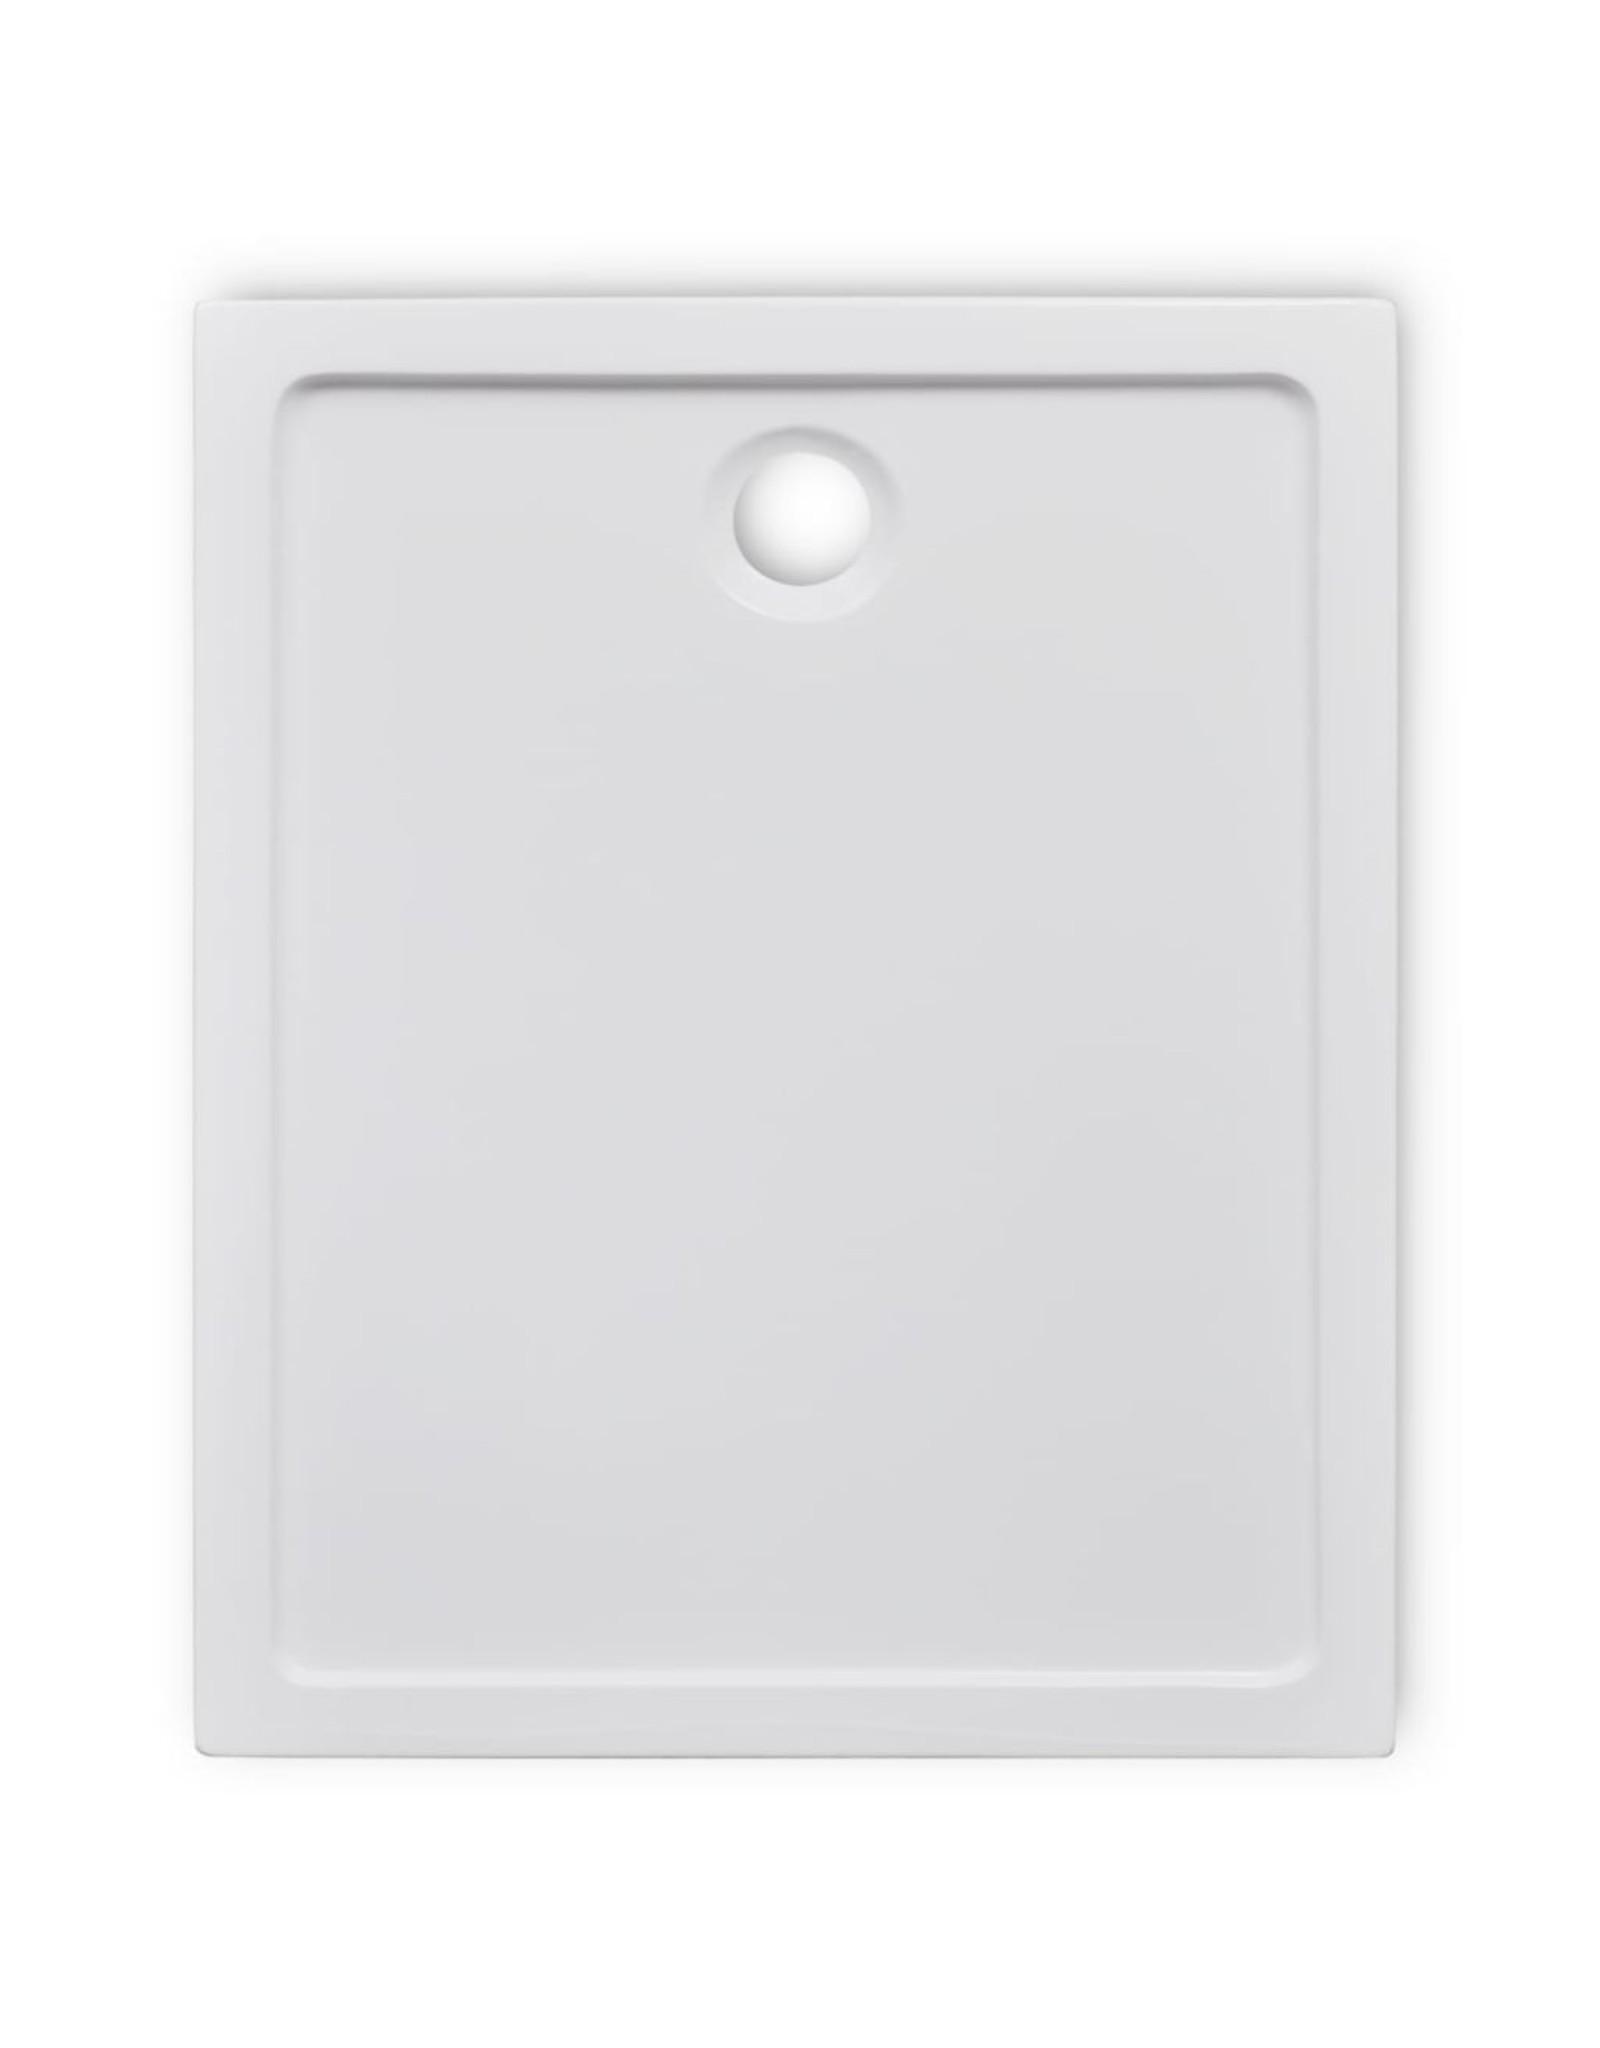 Douchebak rechthoekig 80x100 cm ABS